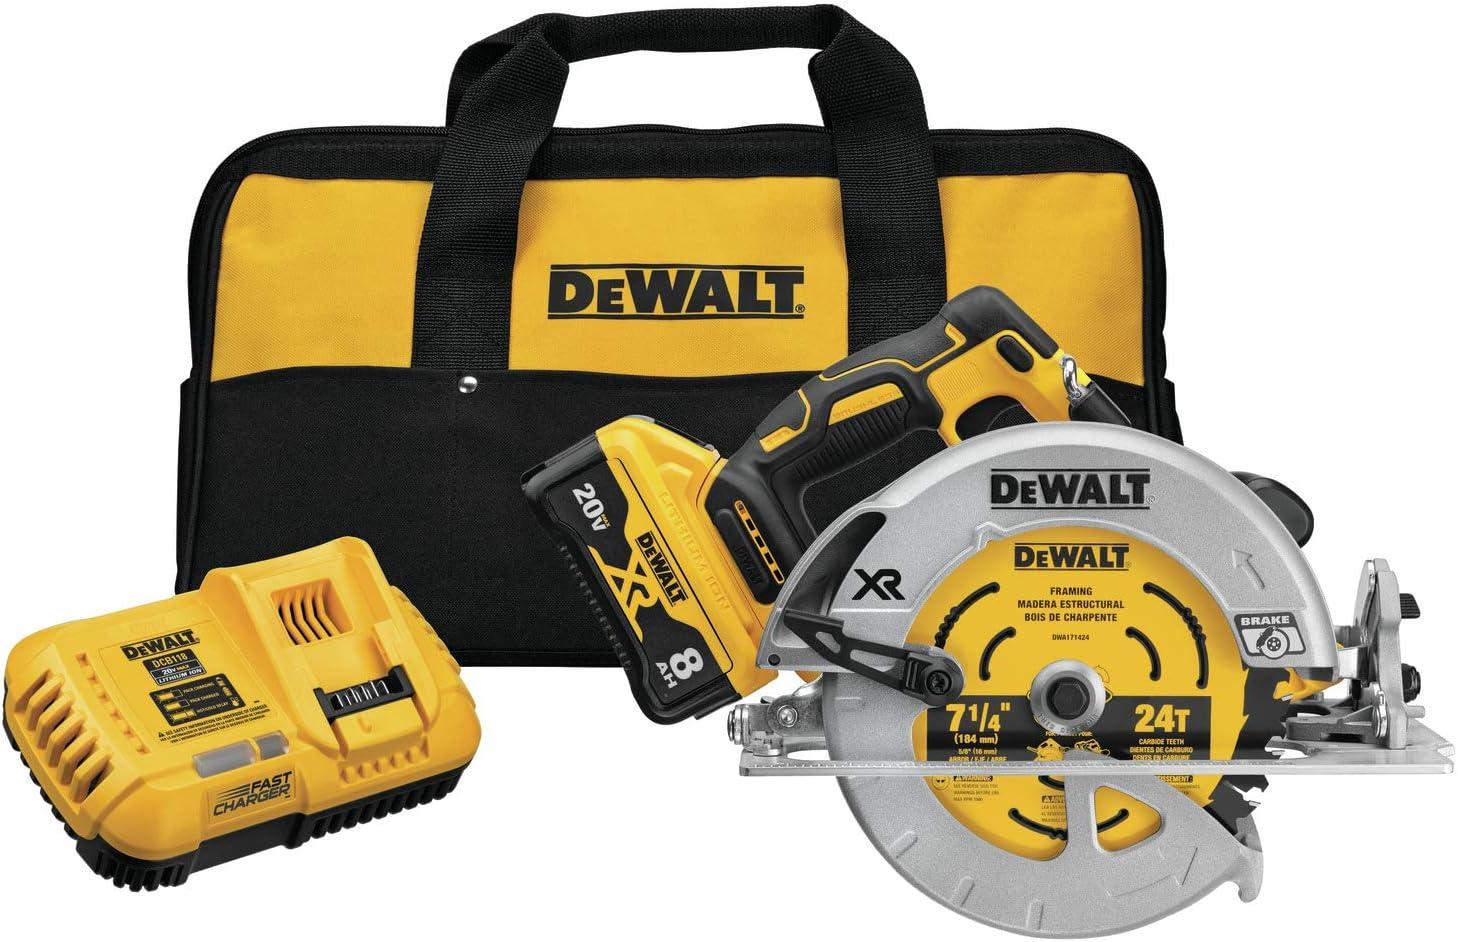 DEWALT 20V MAX XR Circular Saw, 7-1/4-Inch, Brushless, Power Detect Tool Technology (DCS574W1)